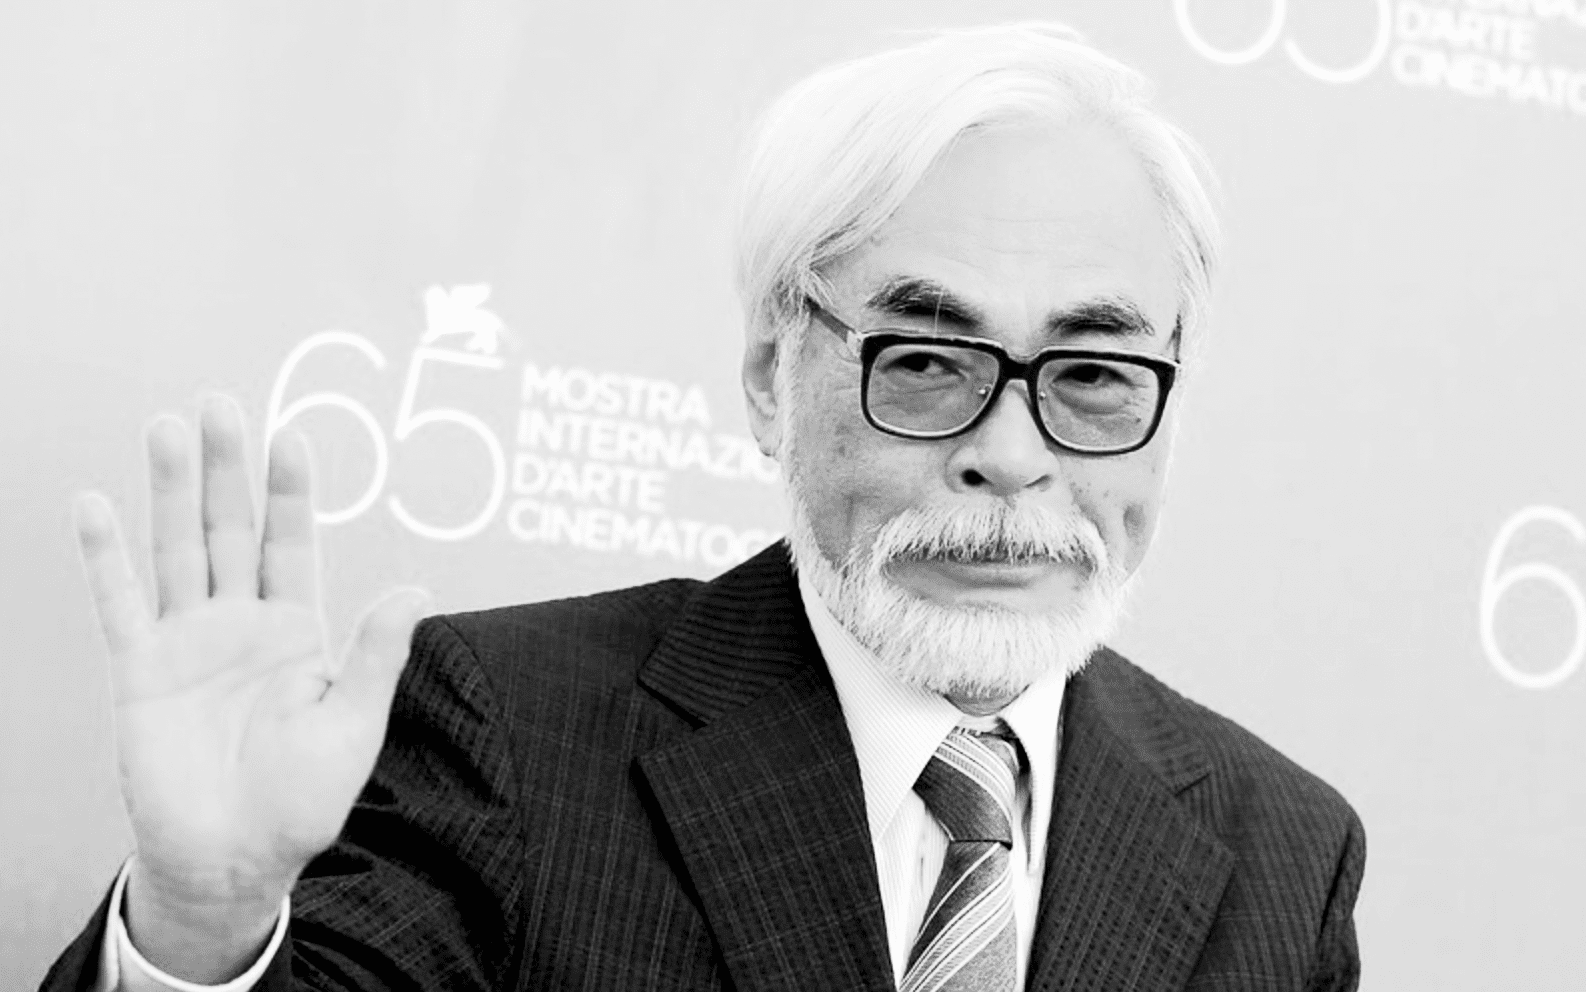 portrait of Hayao Miyazaki waving at camera